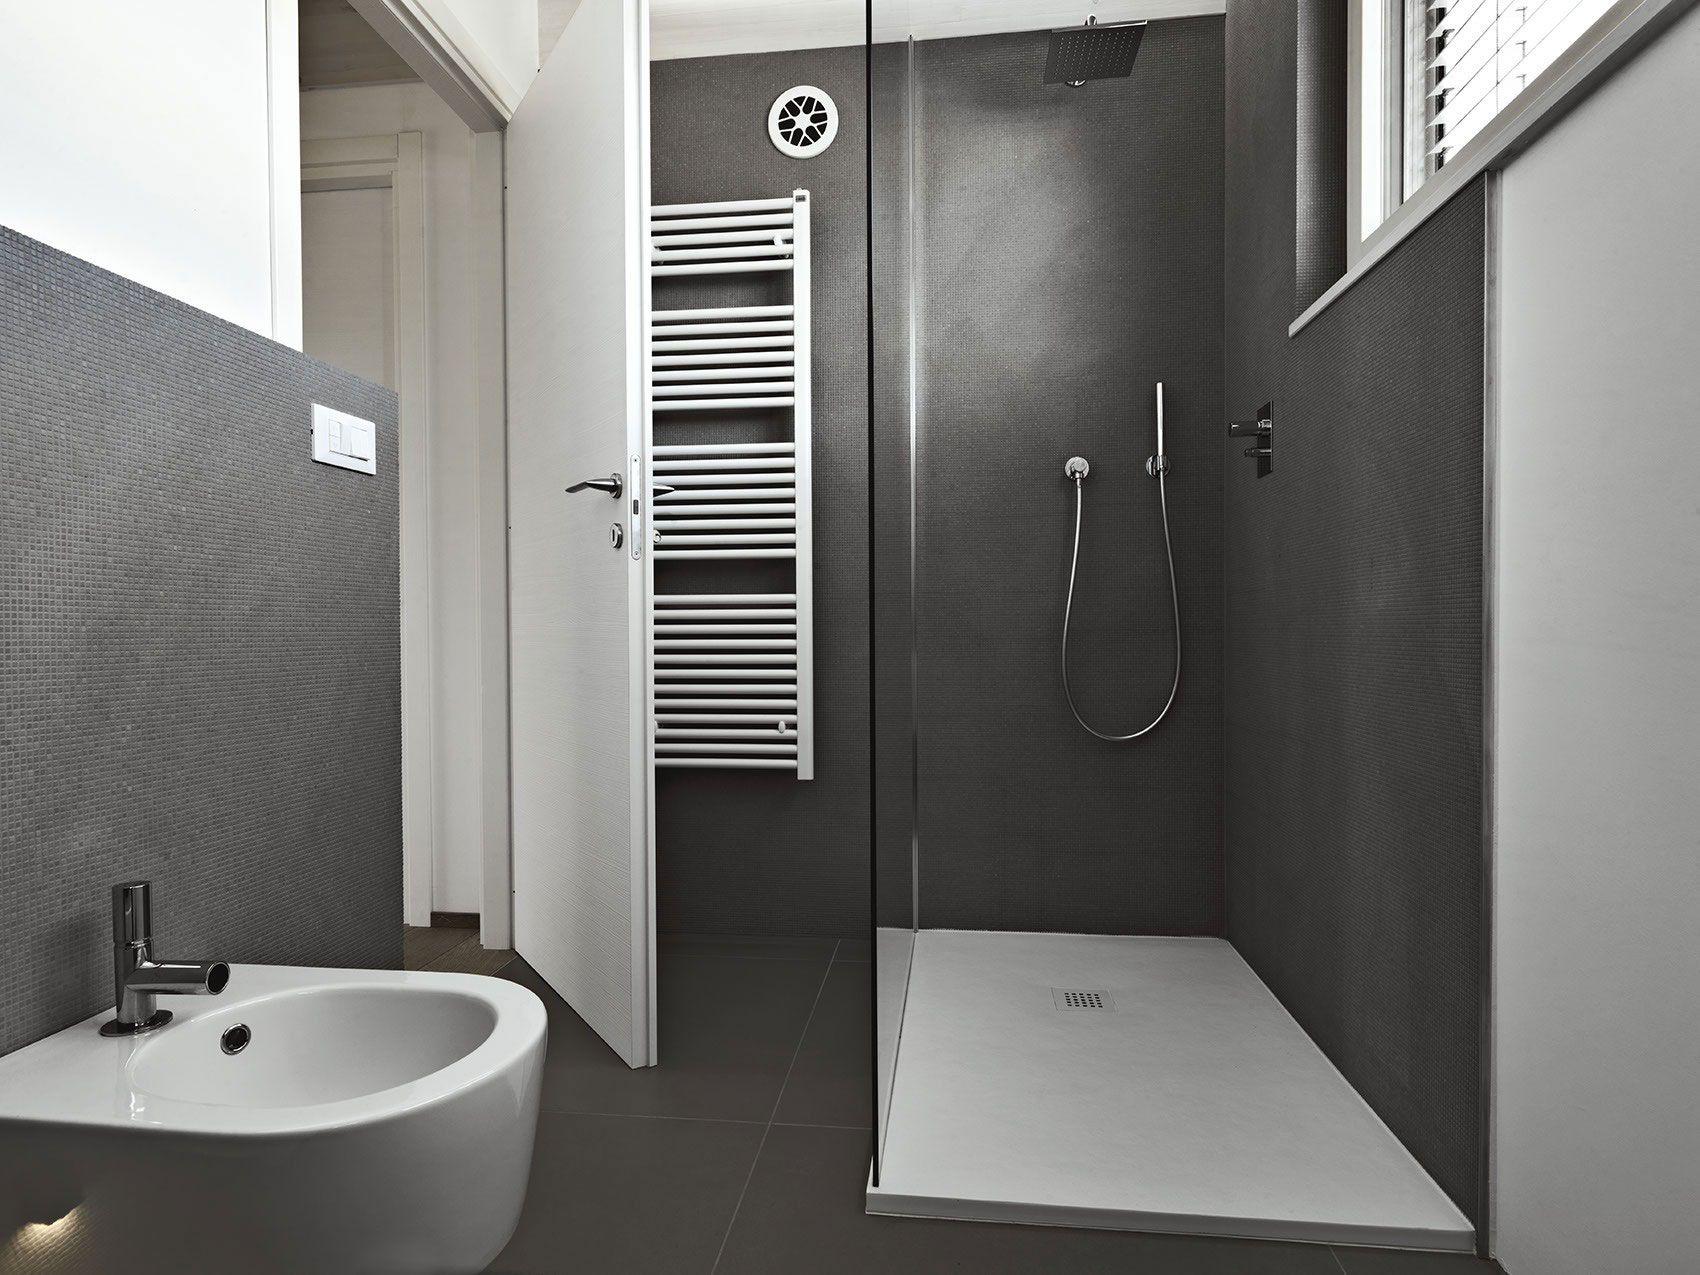 Home In Tollegno By Gian Luca Bazzan Idees Pour La Maison Maison Douche